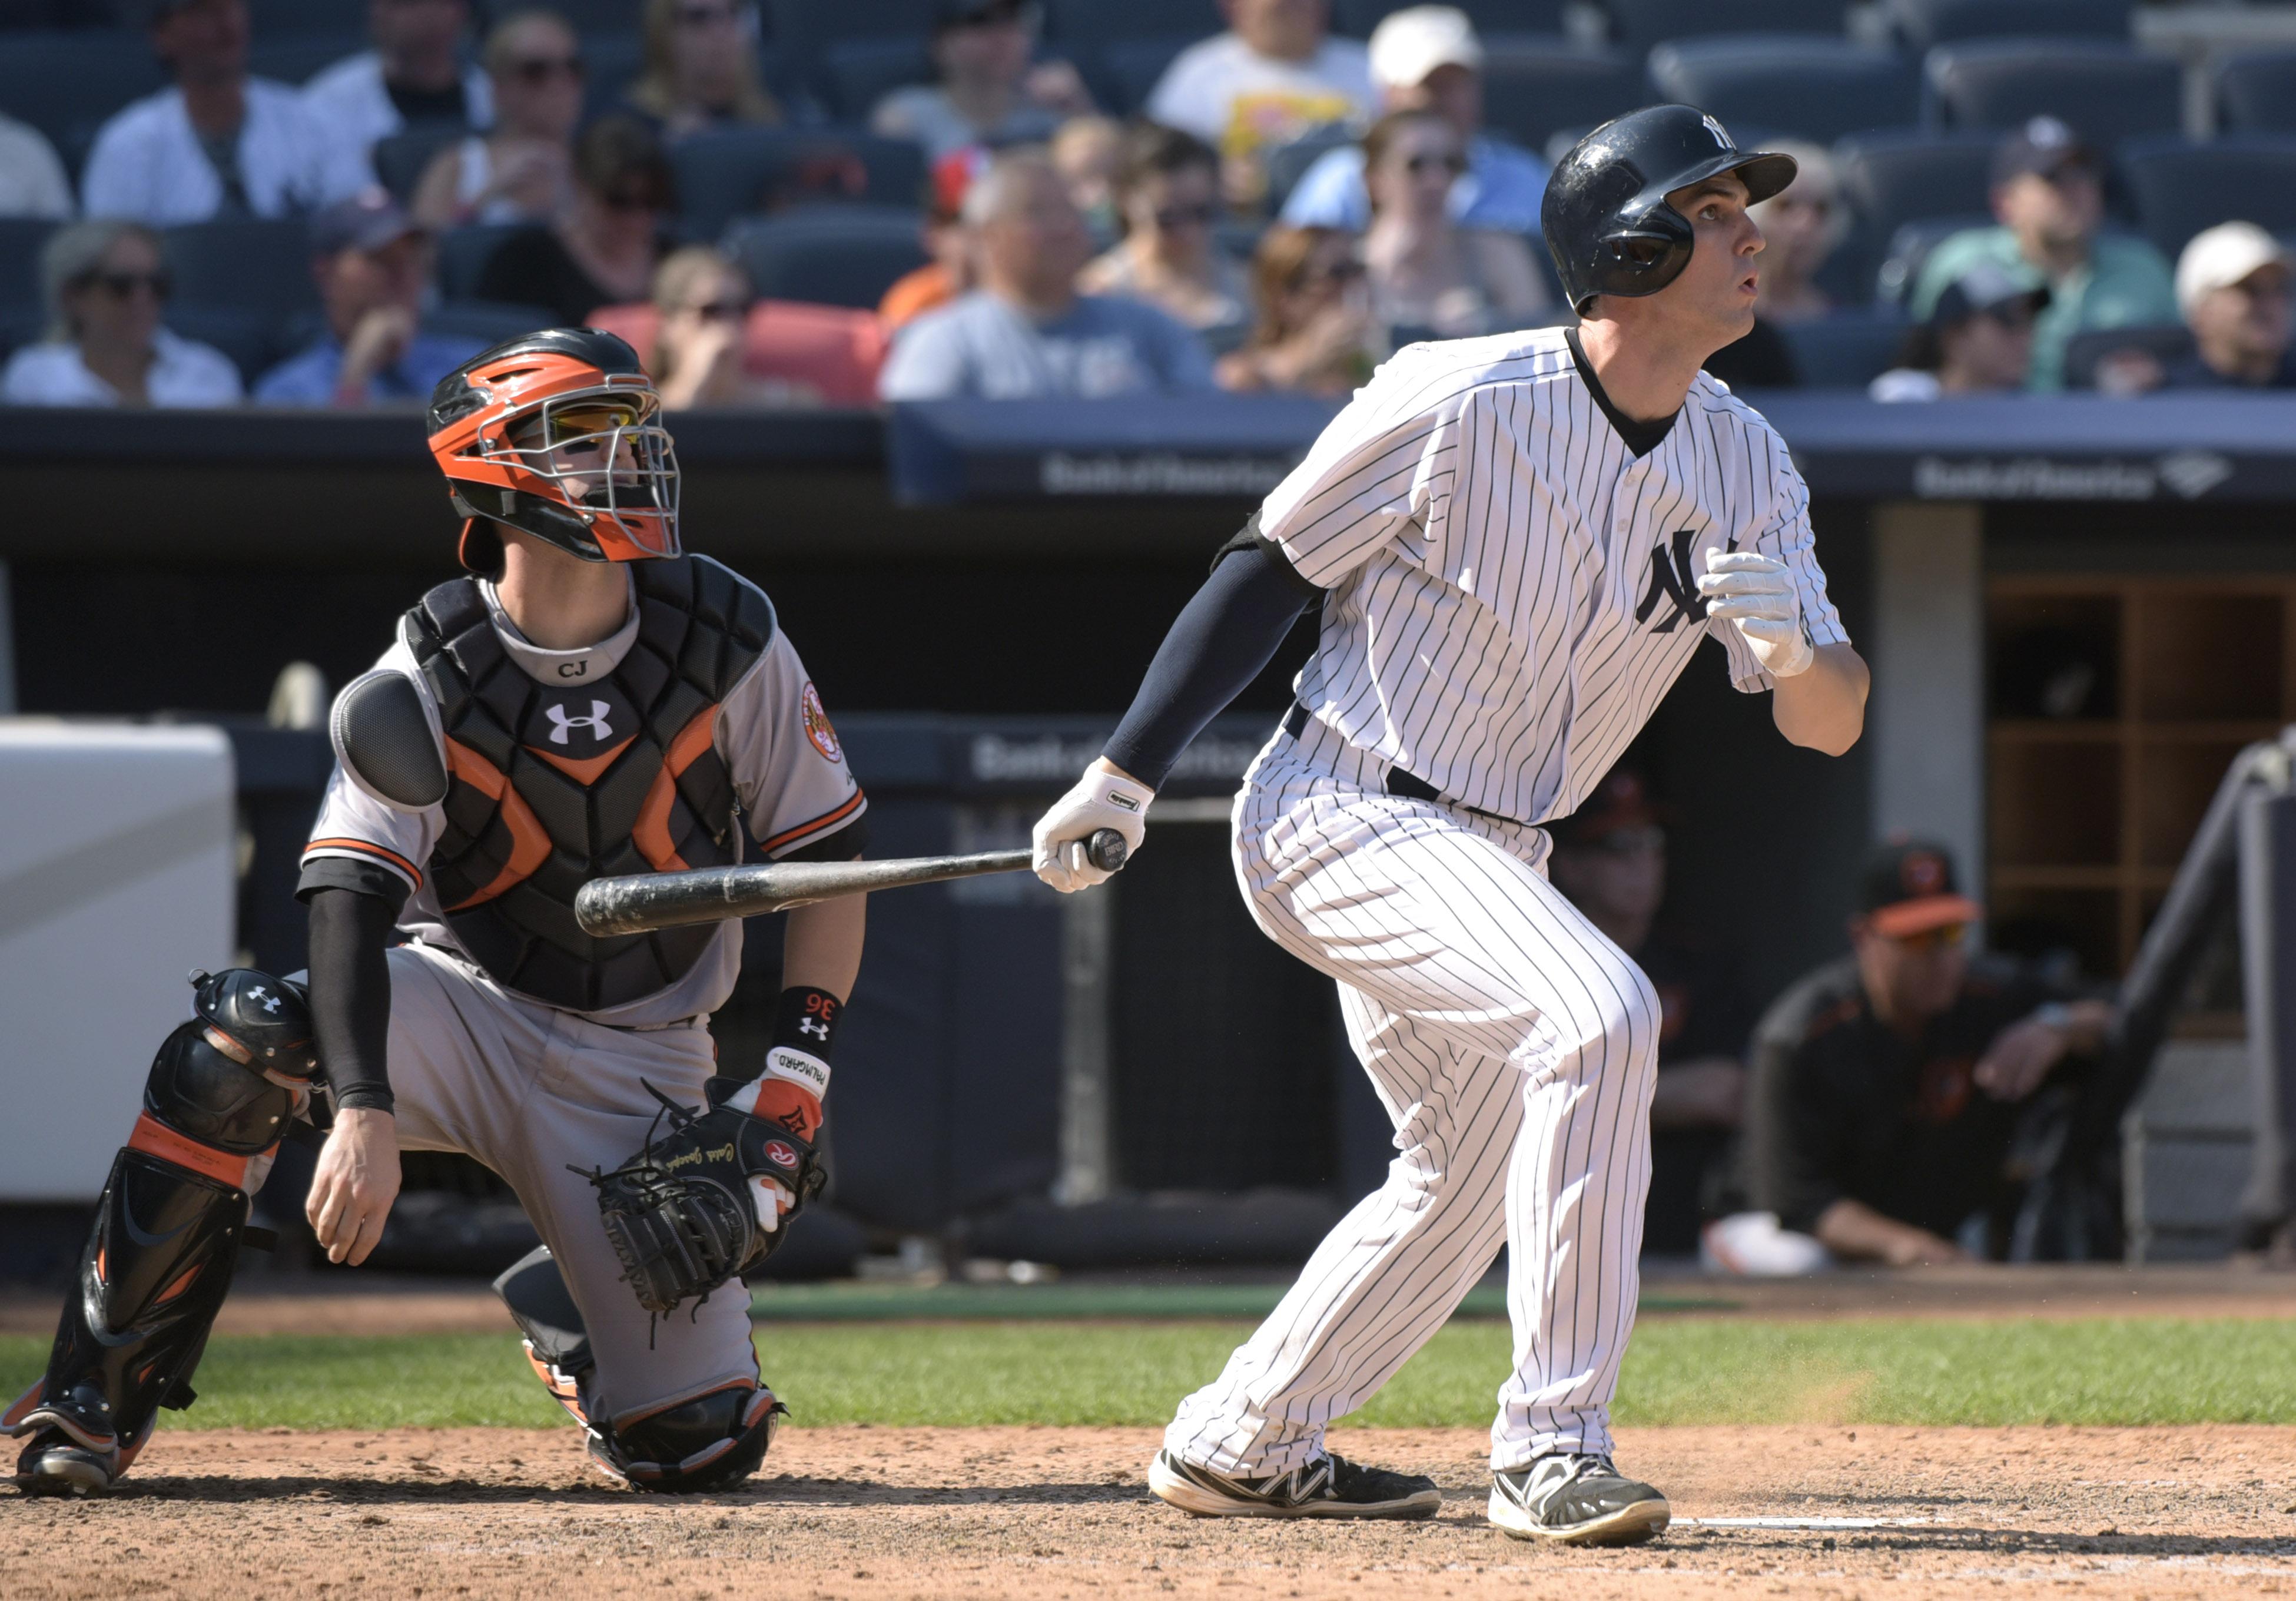 New York Yankees' Greg Bird, right, hits a three-run home run as Baltimore Orioles catcher Caleb Joseph, left, looks on during the seventh inning of a baseball game Monday, Sept. 7, 2015, at Yankee Stadium in New York. (AP Photo/Bill Kostroun)